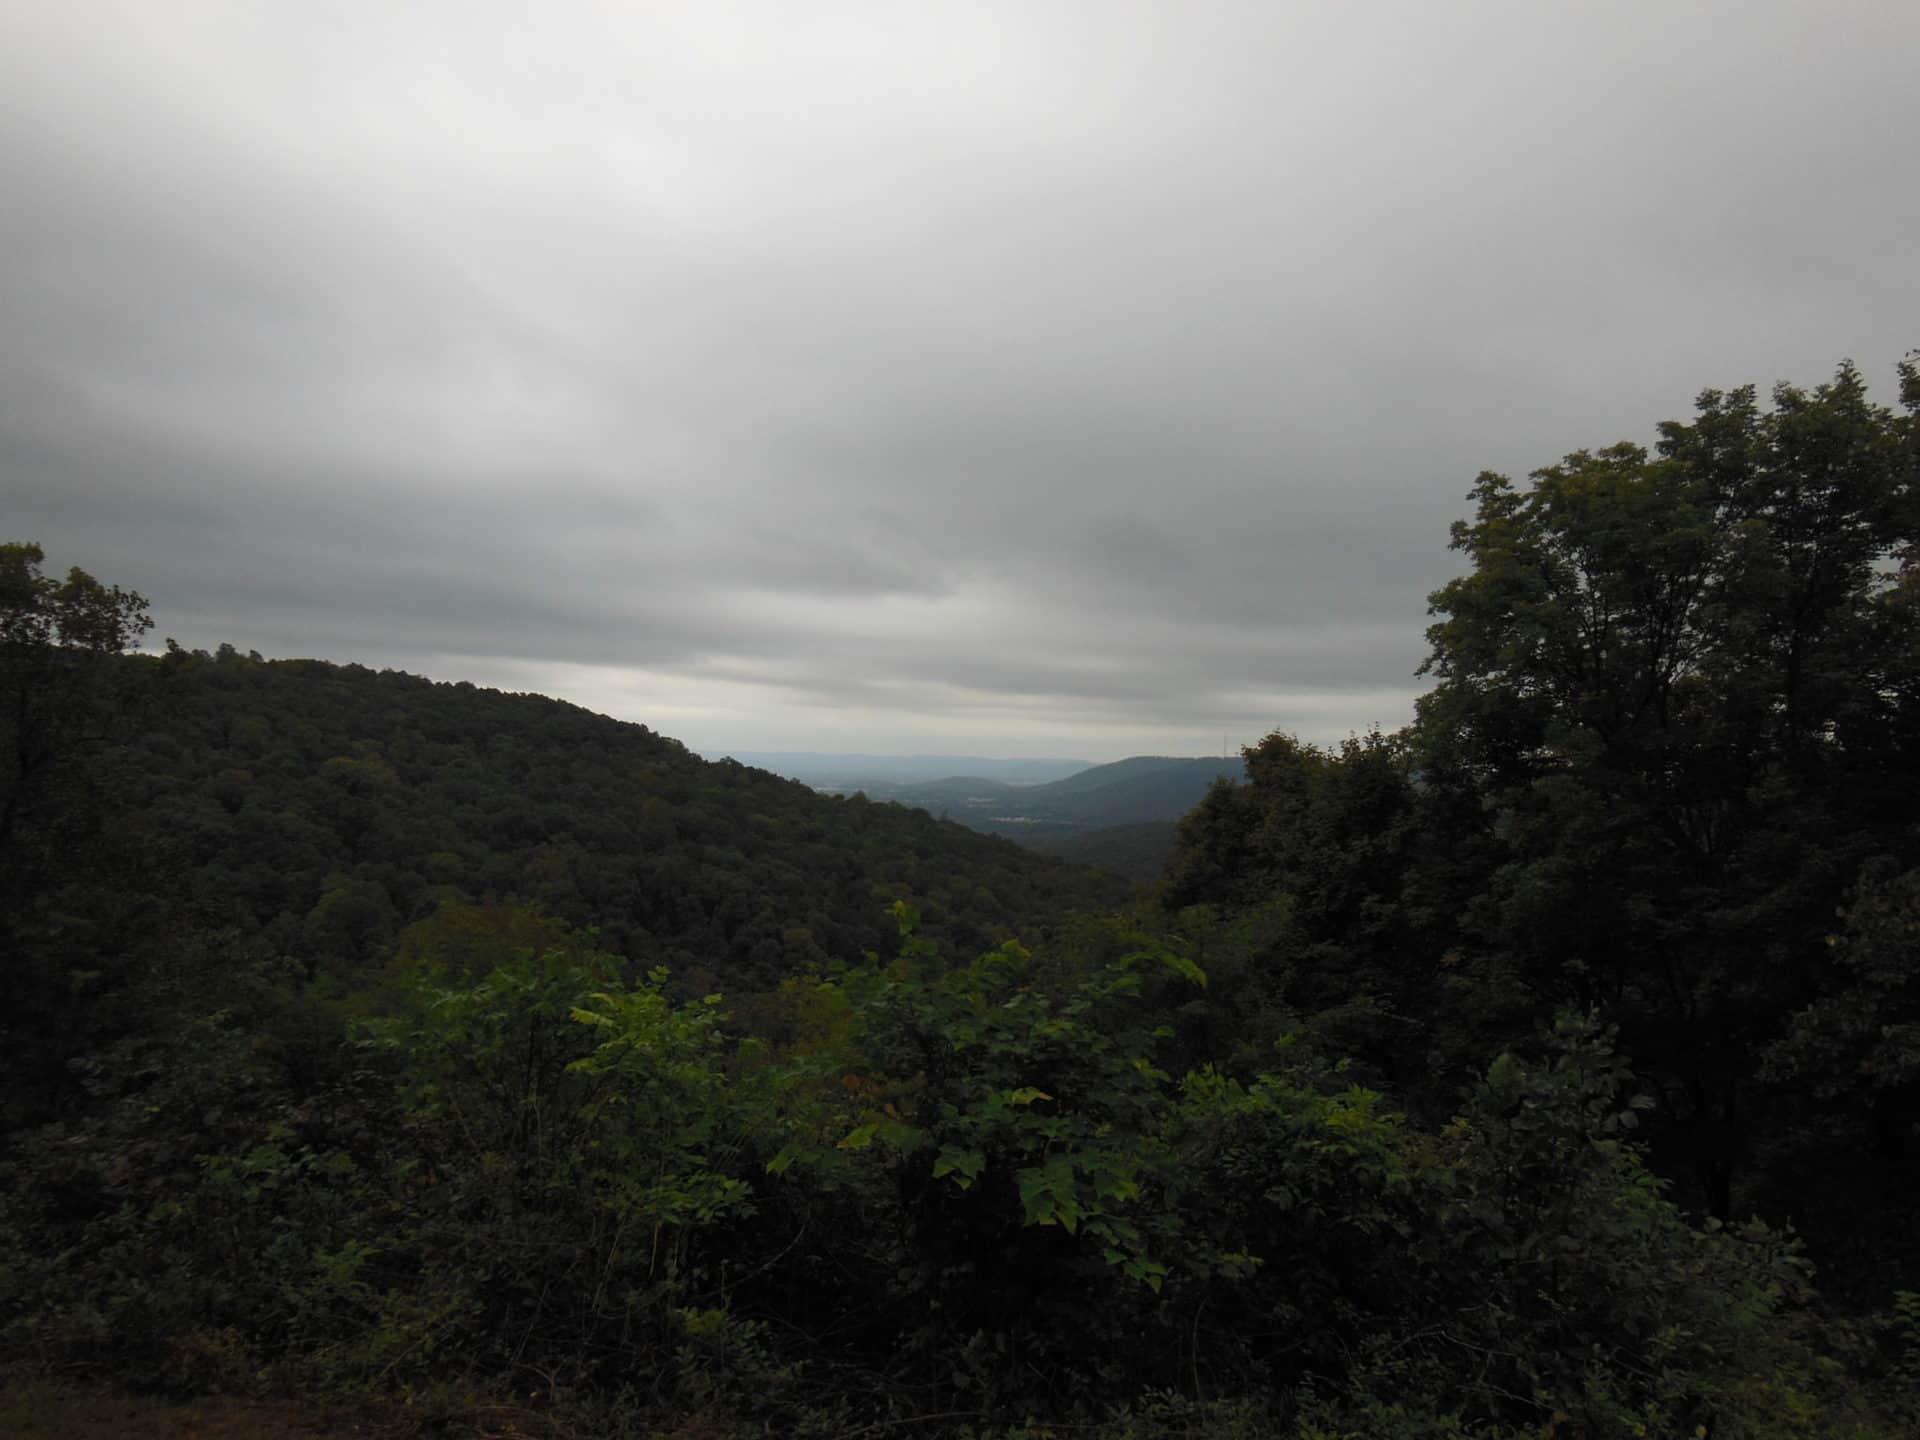 Monte Sano State Park - View 1